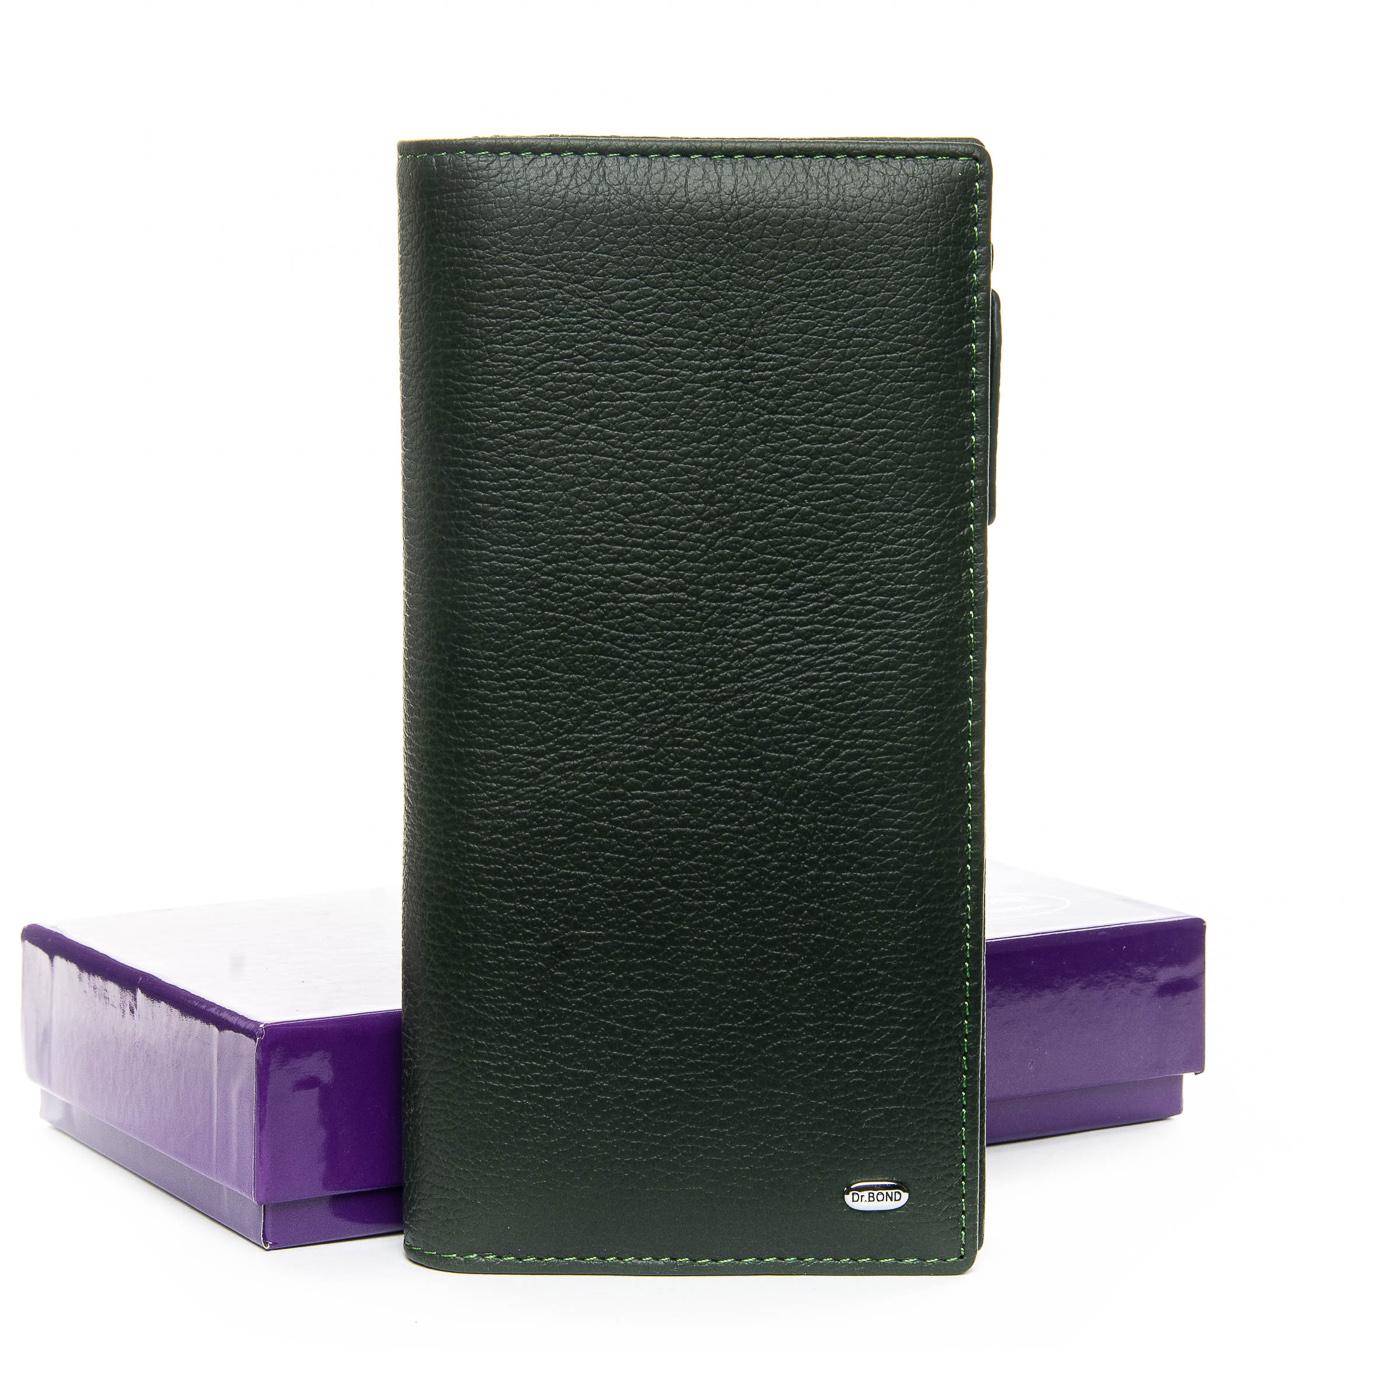 Кошелек Classic кожа DR. BOND WMB-3M green